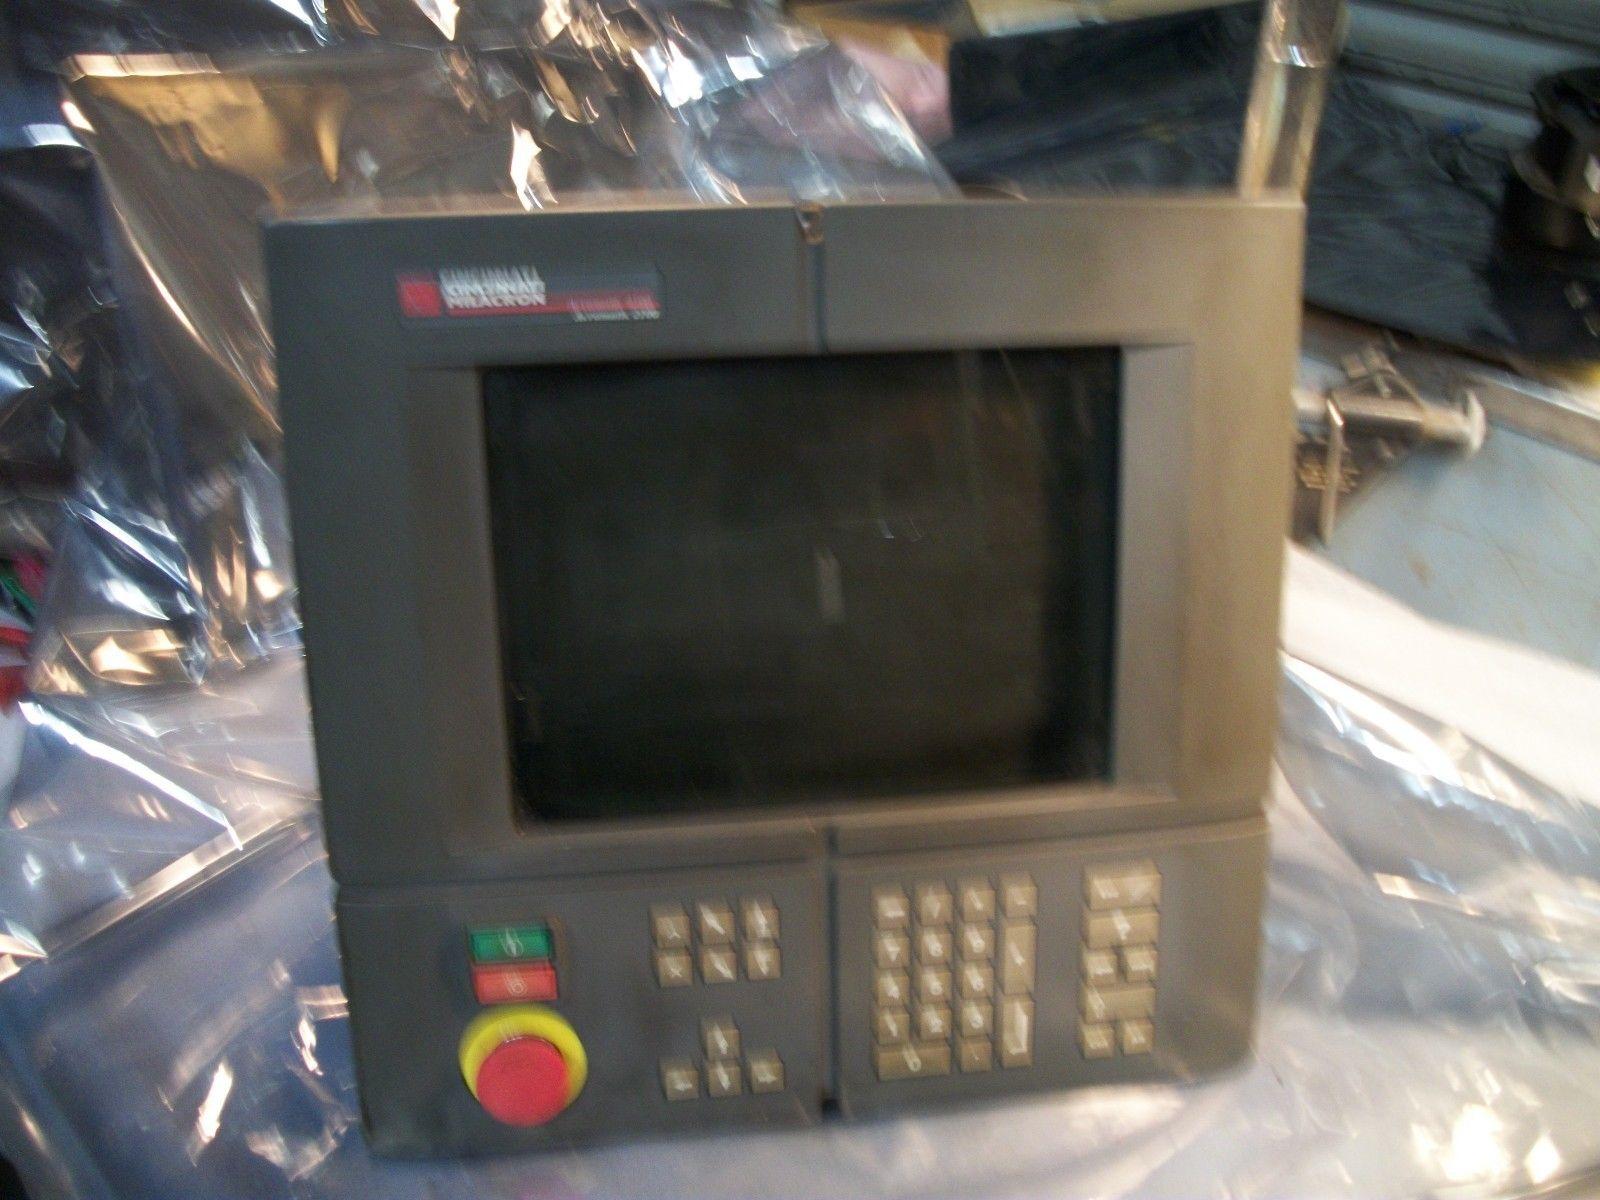 Siemens Cincinnati Acramatic 2100 Operator Station with CRT 1-424-2135